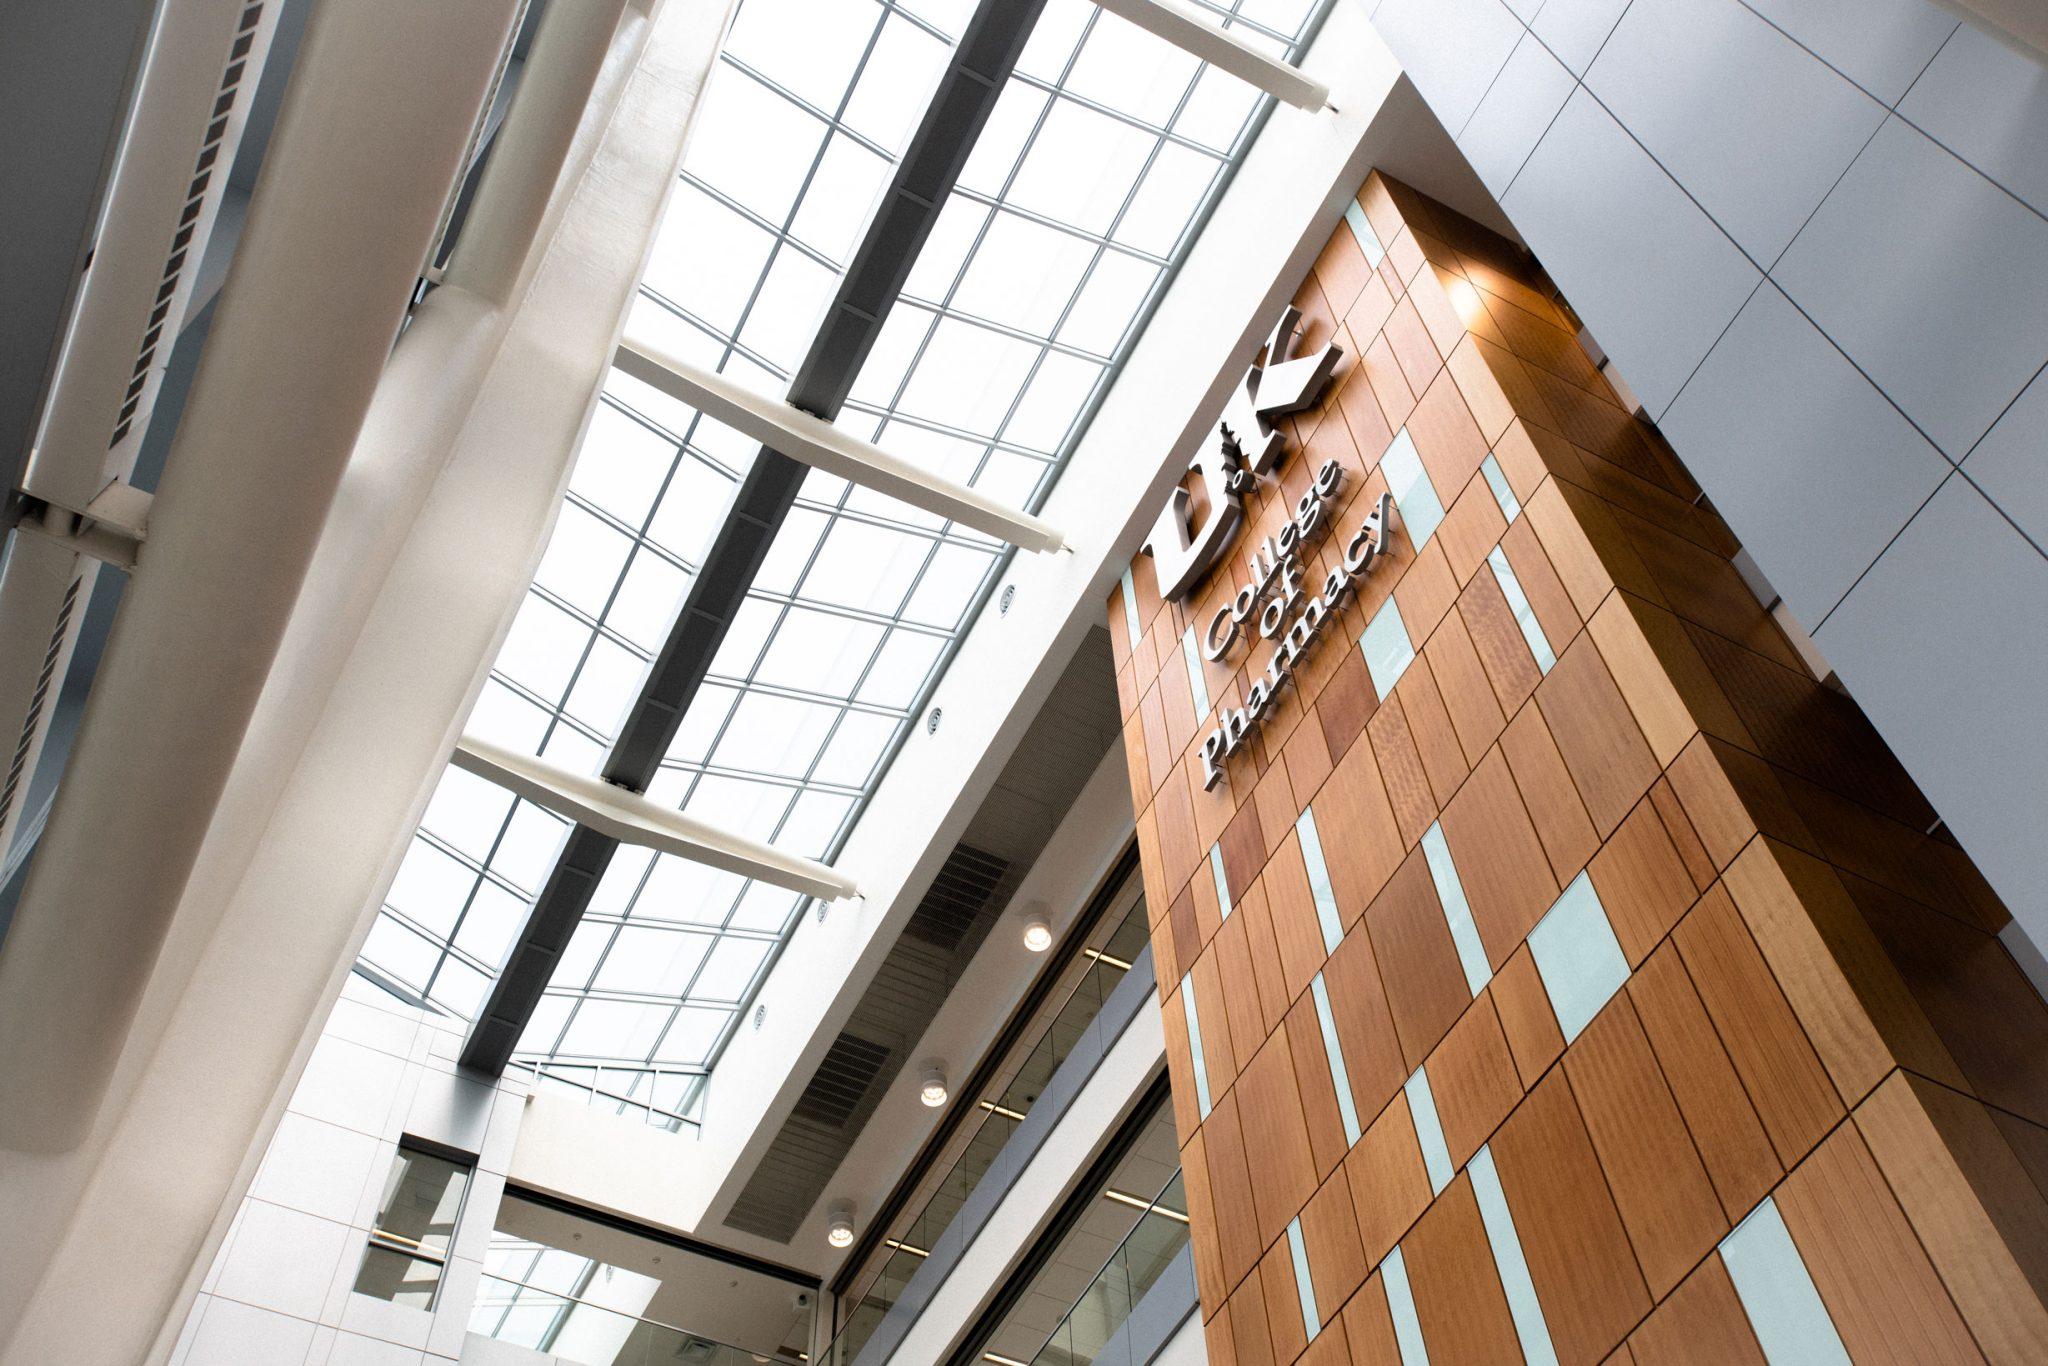 UK College of Pharmacy entrance lobby.